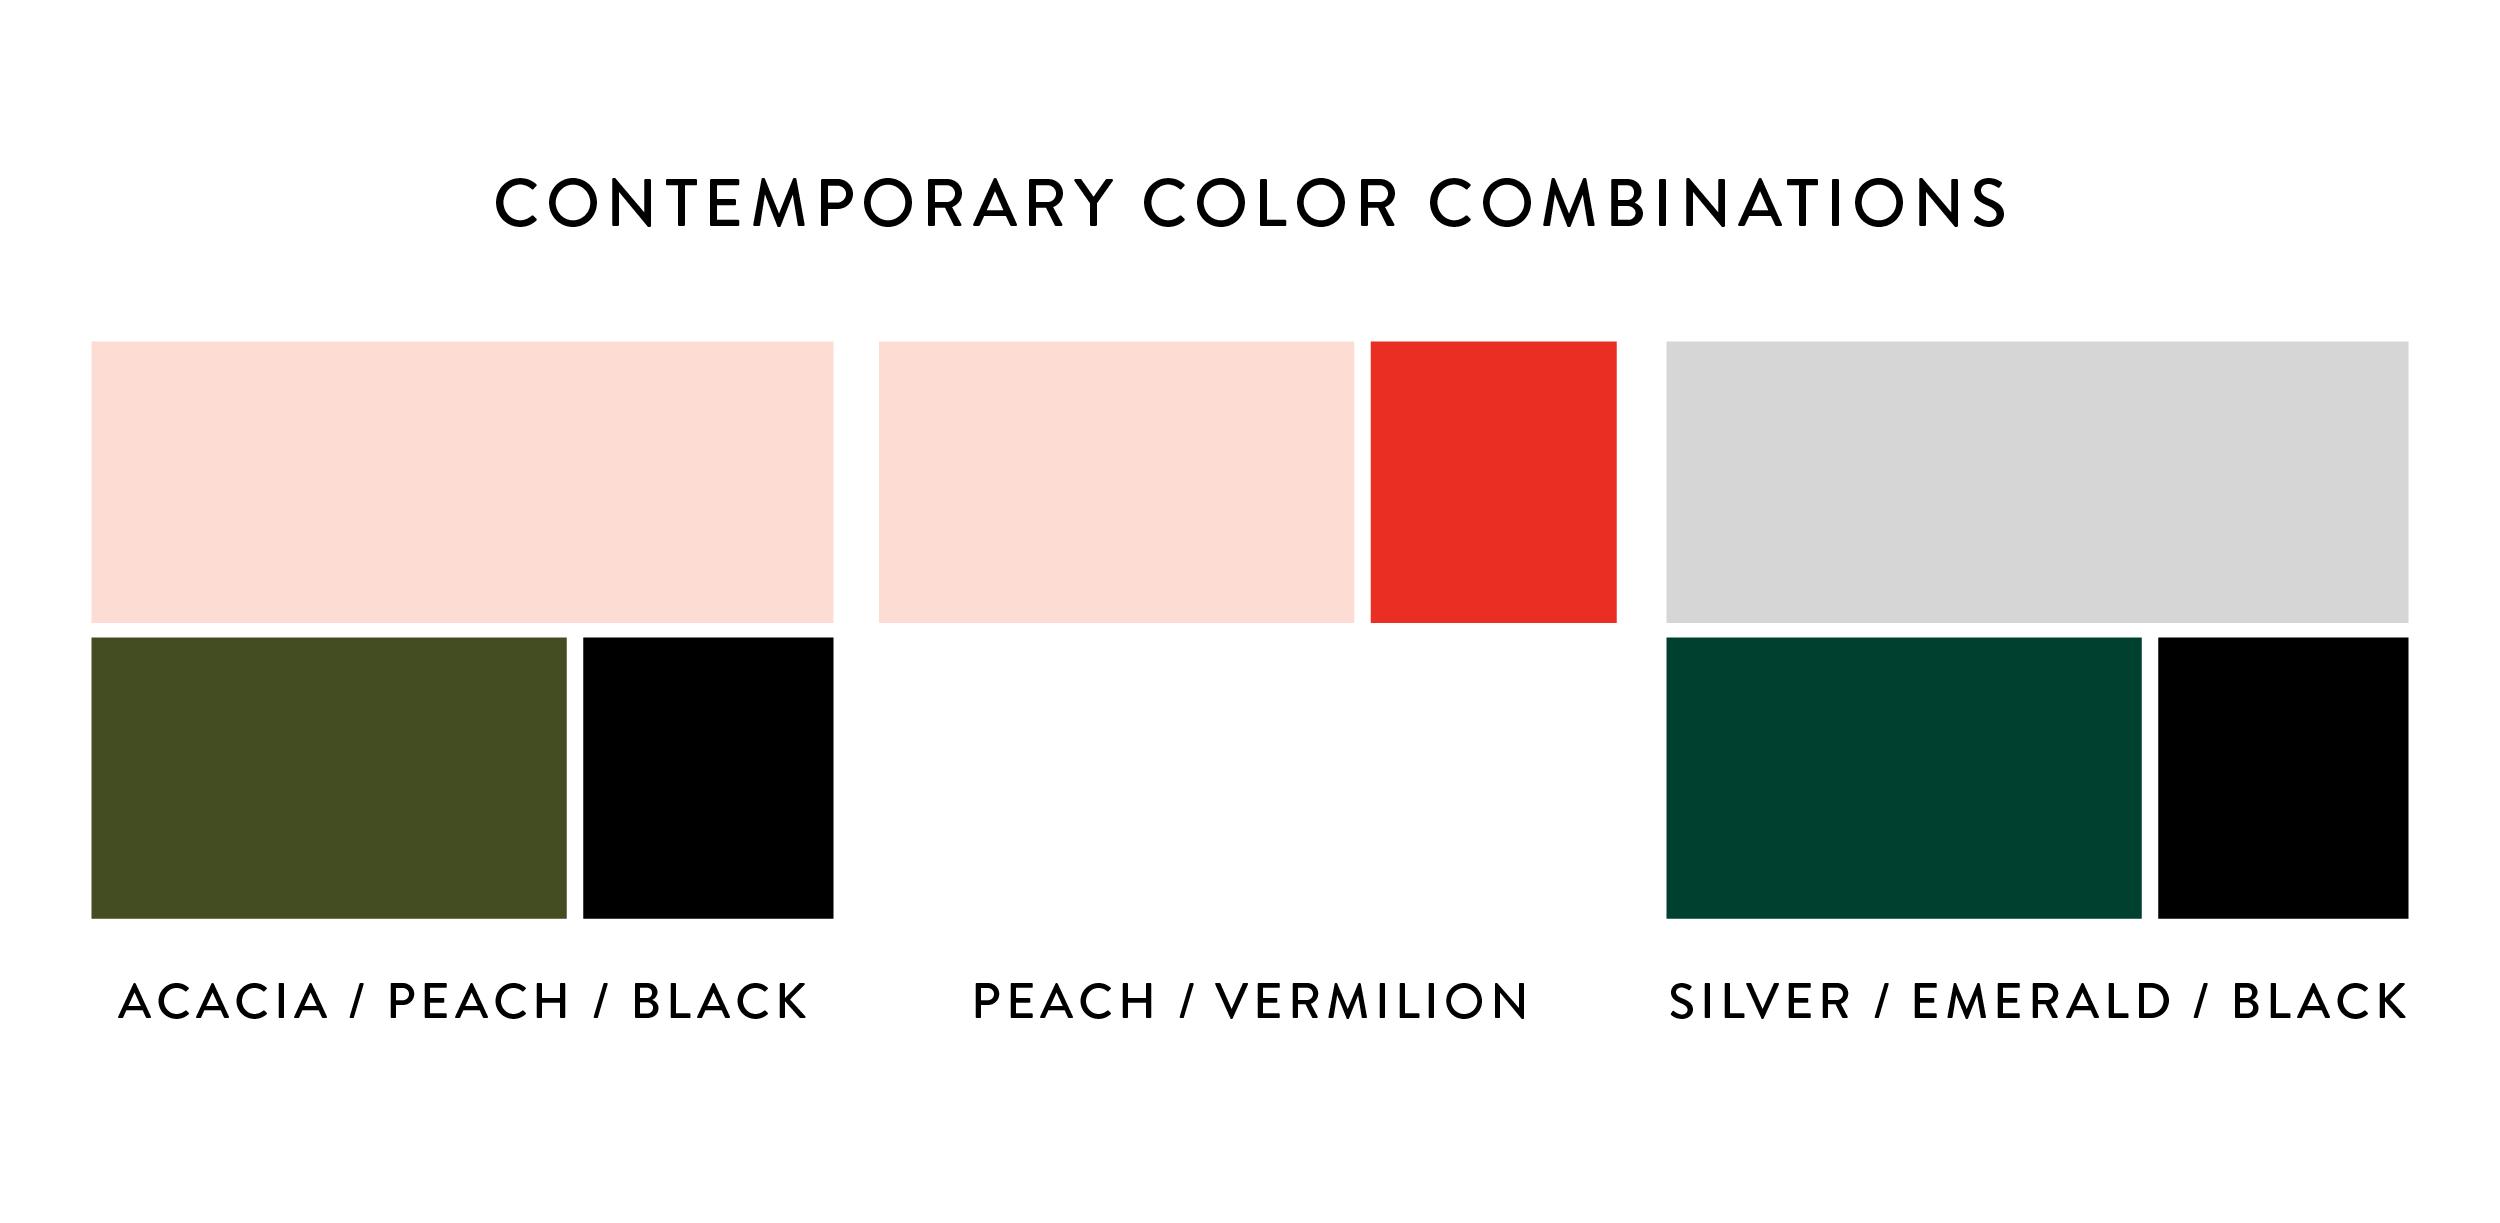 contemporarycoloroptions.png